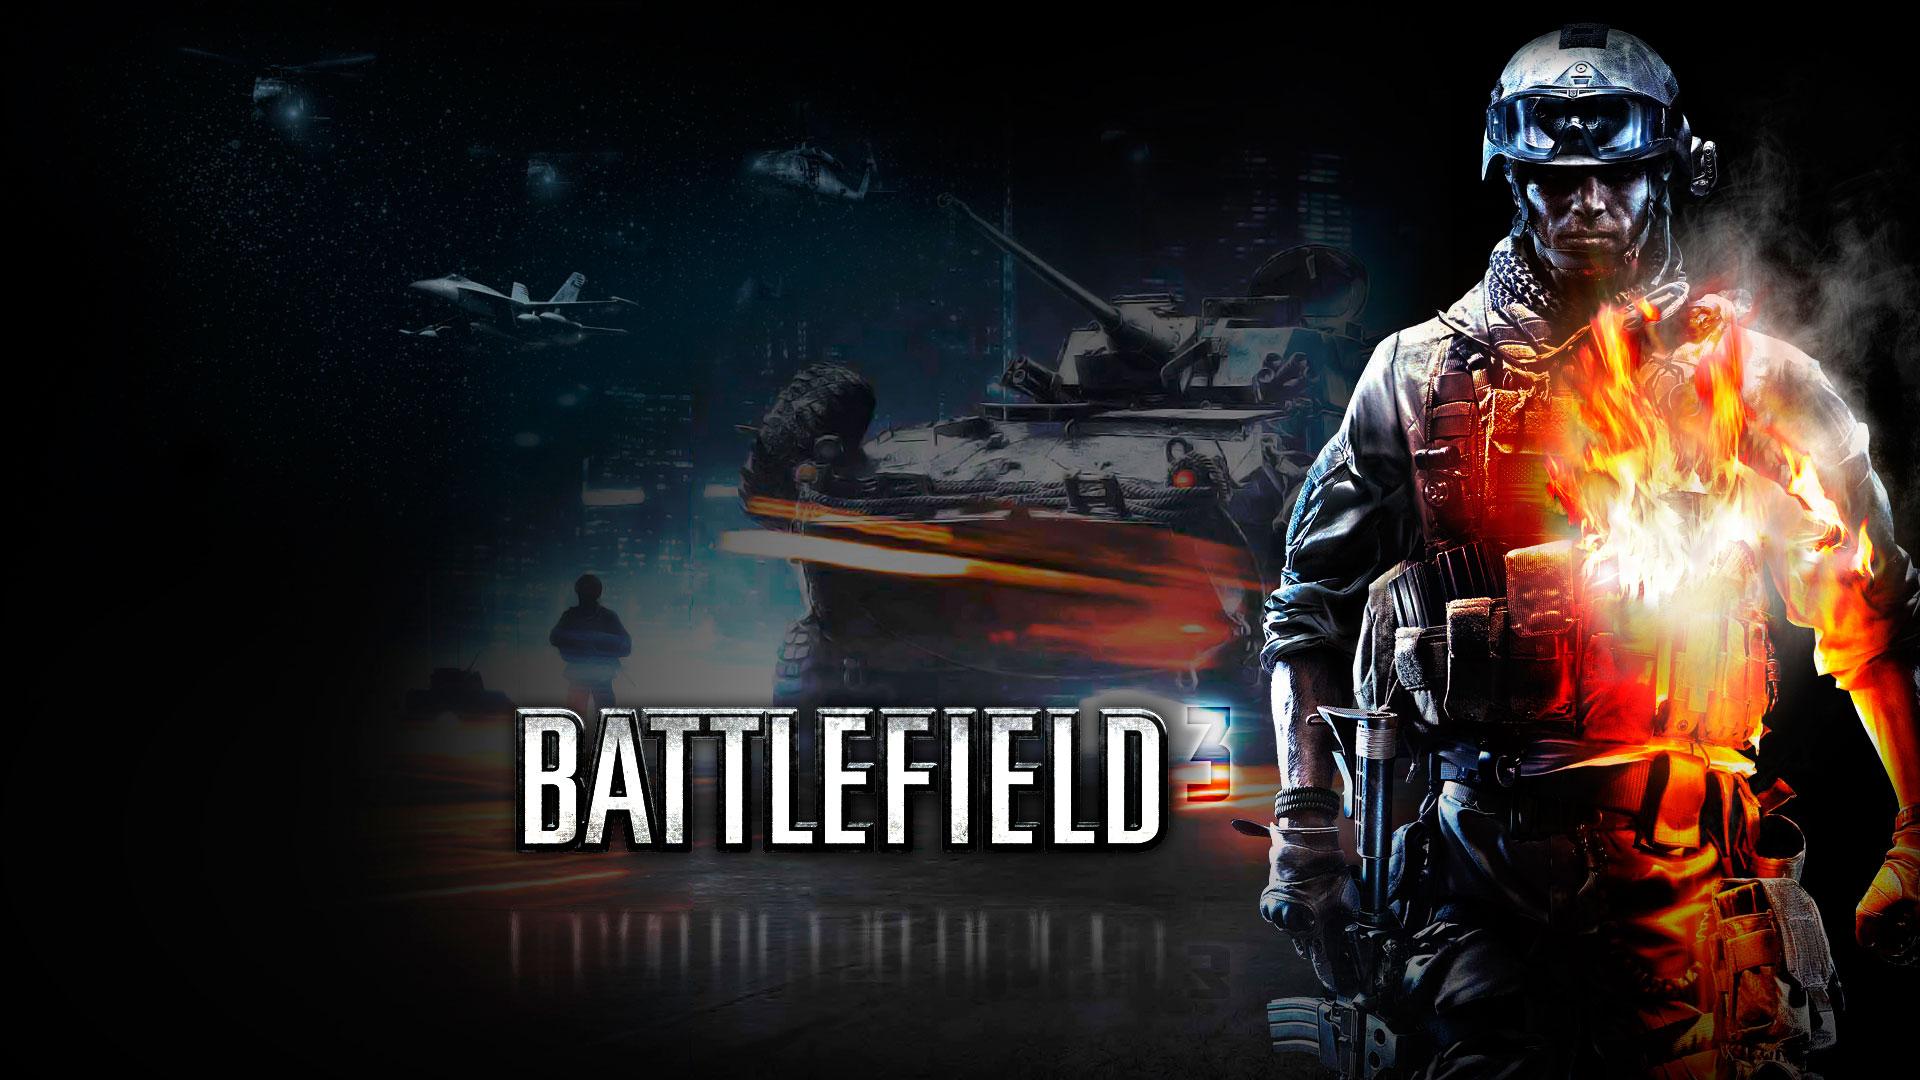 Battlefield wallpaper 1080p wallpapersafari - Battlefield 3 hd wallpaper 1080p ...